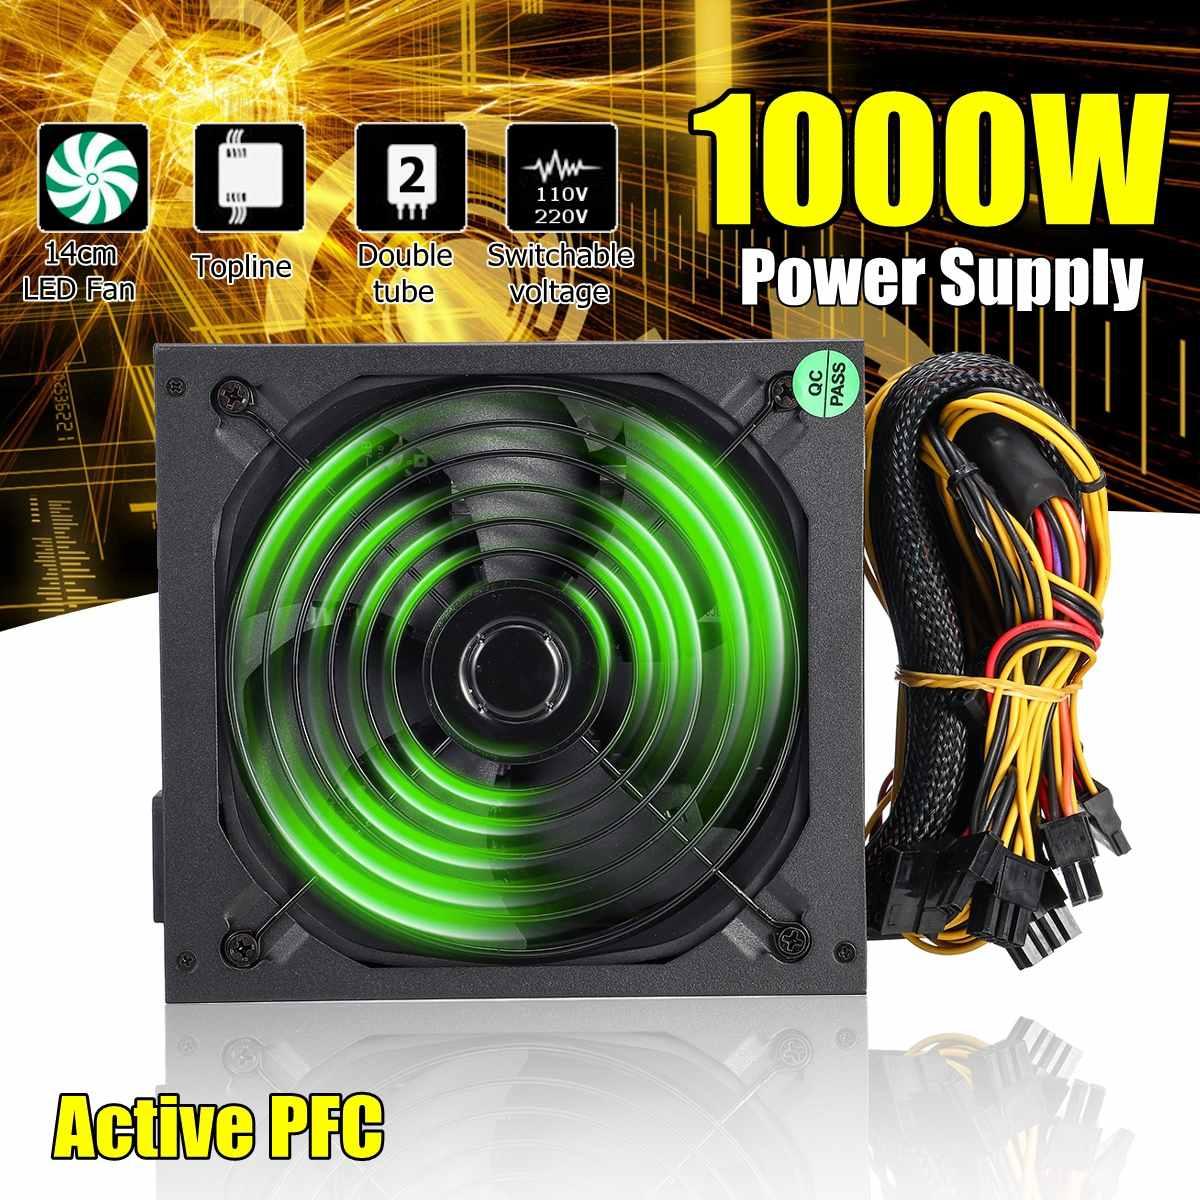 110~220V 1000W PC Power Supply 140mm LED Fan 24 Pin Active PFC PCI SATA ATX 12V Computer Power Supply